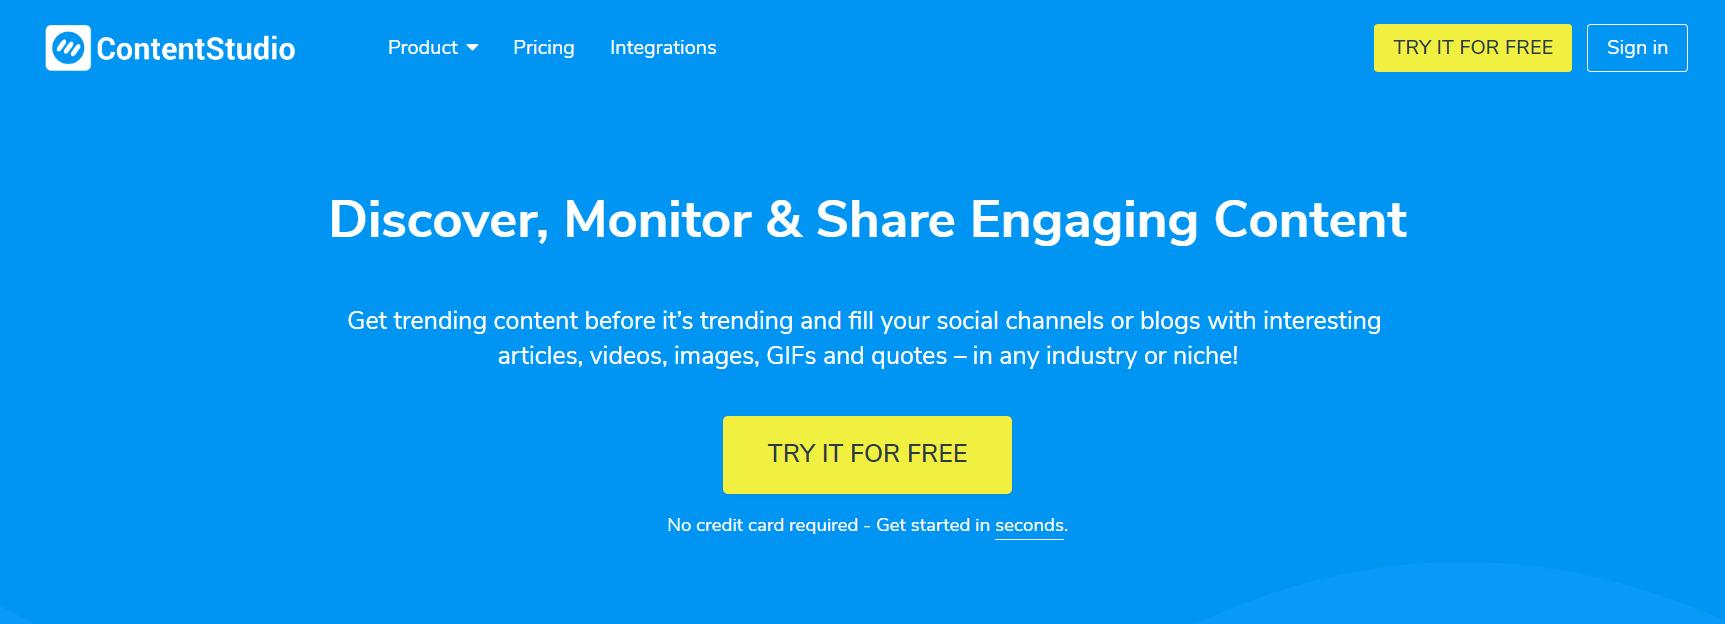 ContentStudio Review- Social Media Management Platform